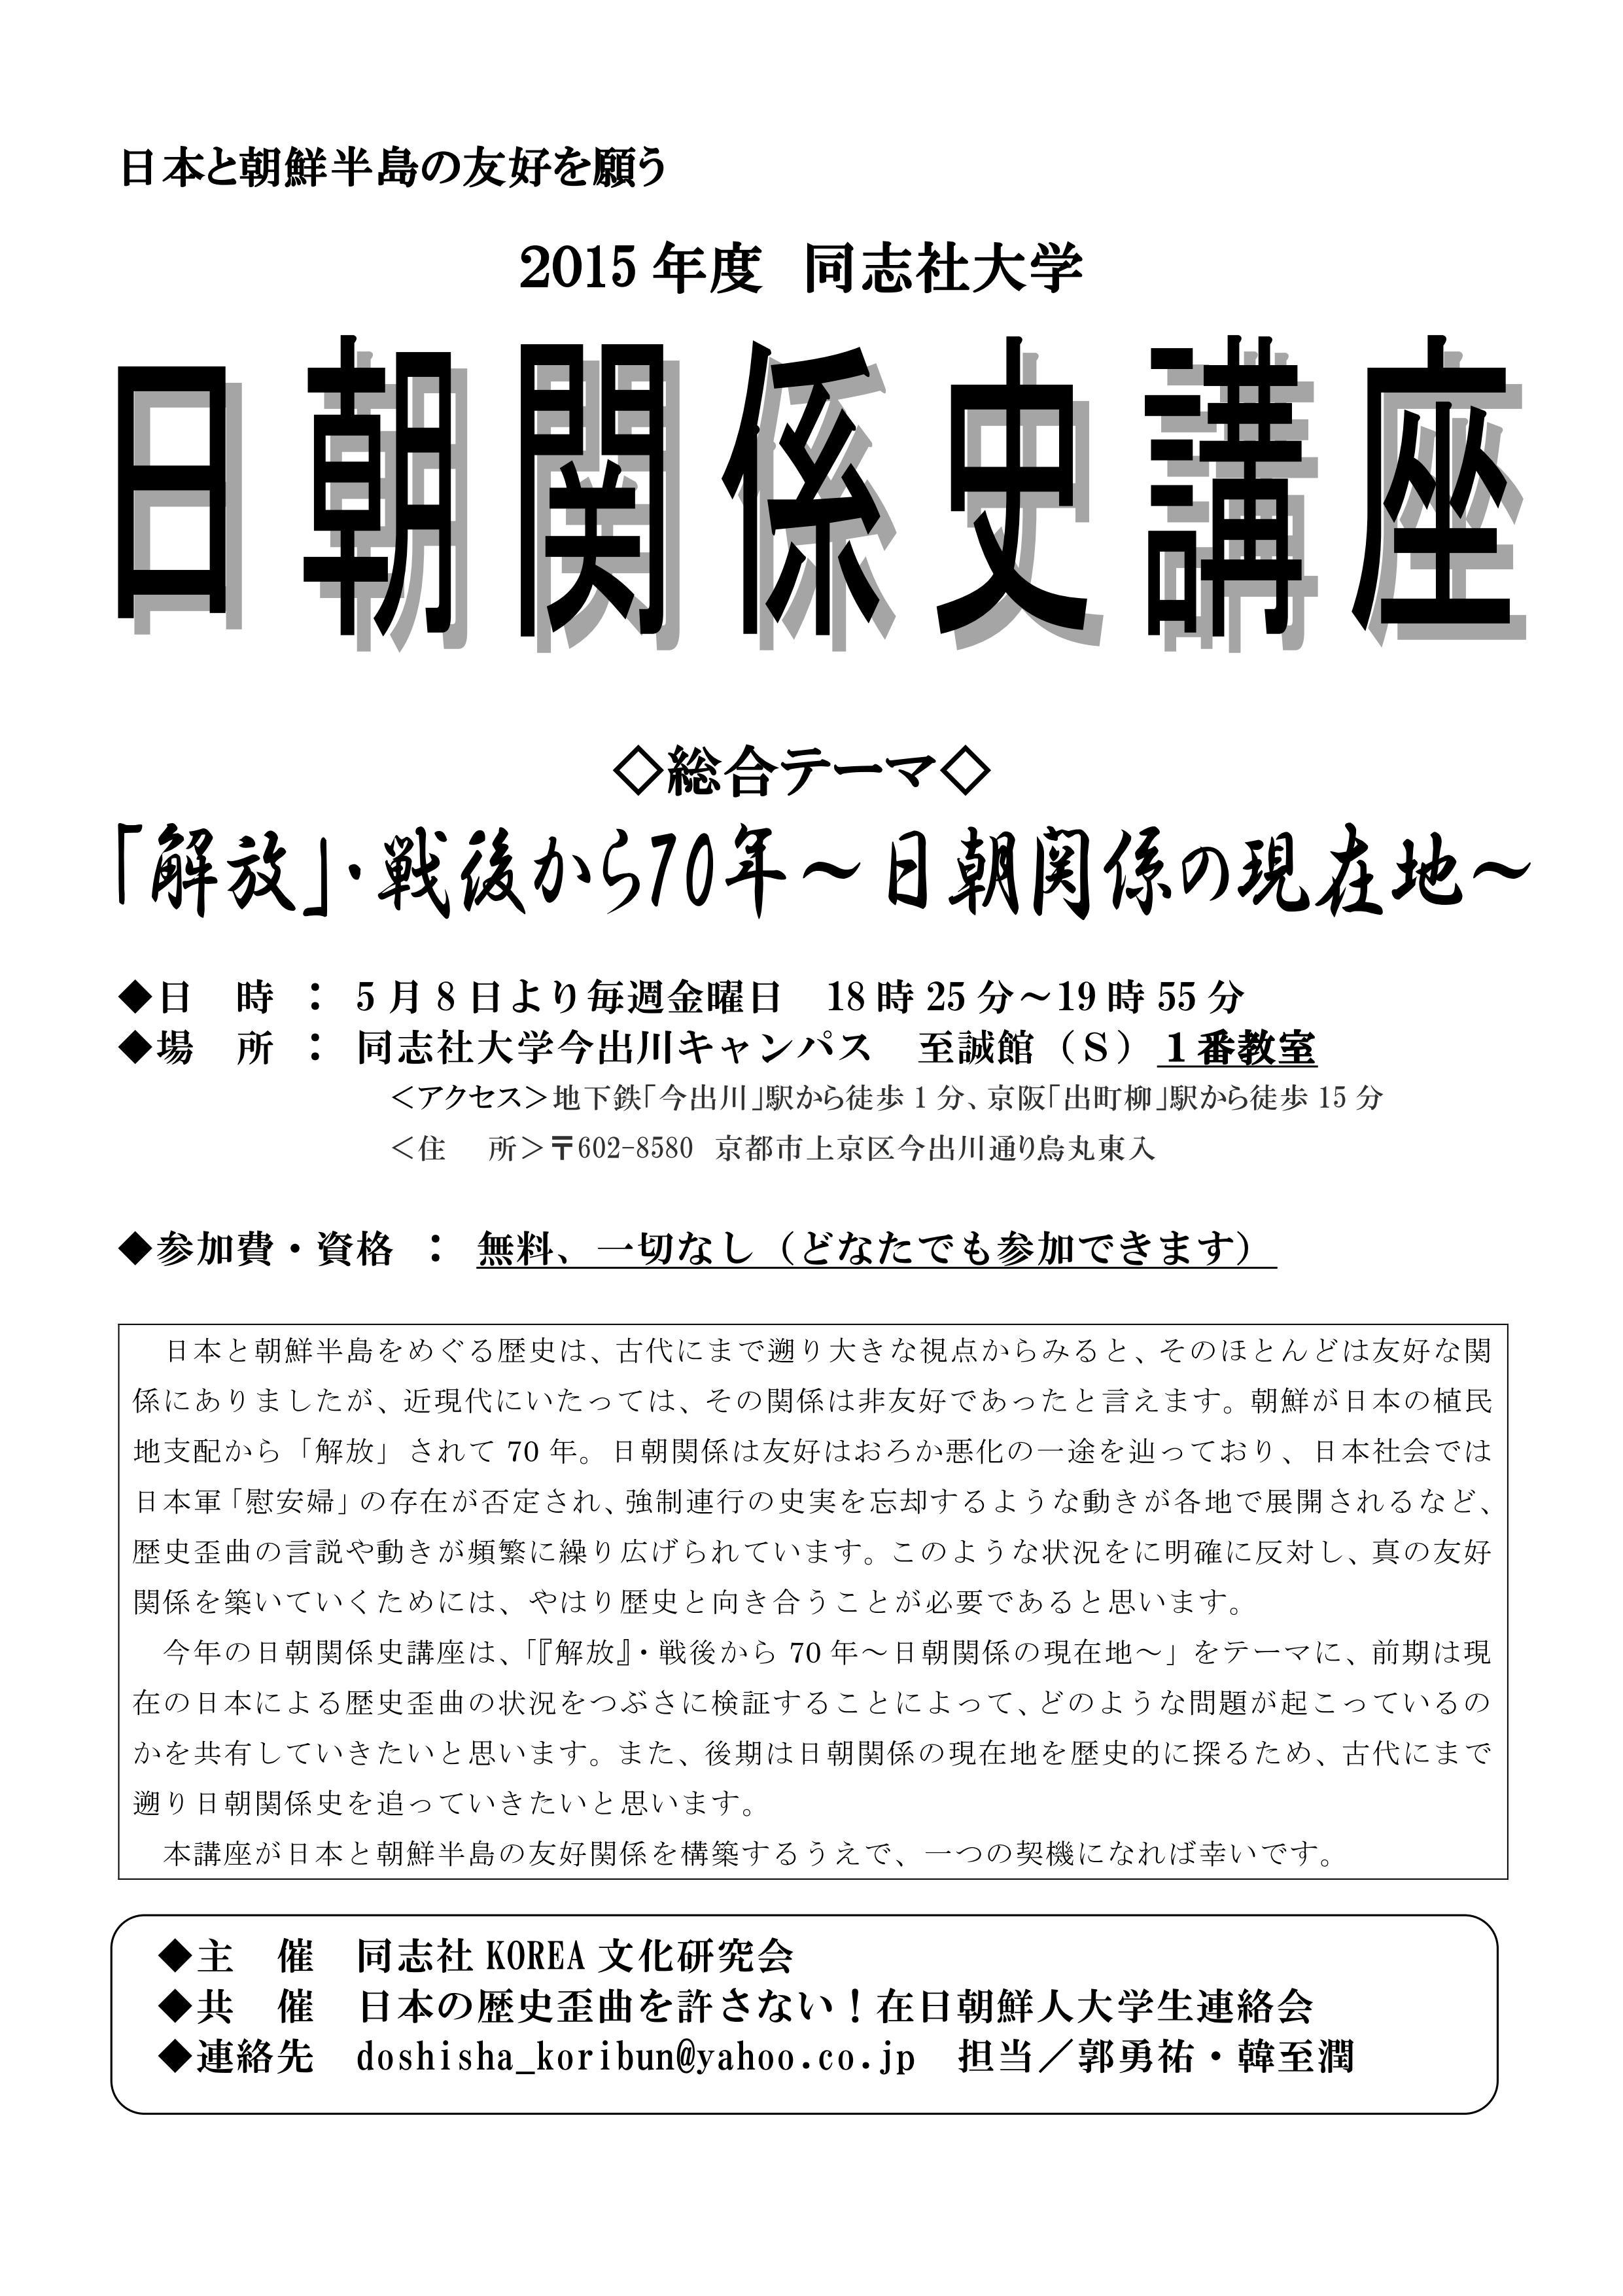 15日朝関係史講座 前期チラシ_01